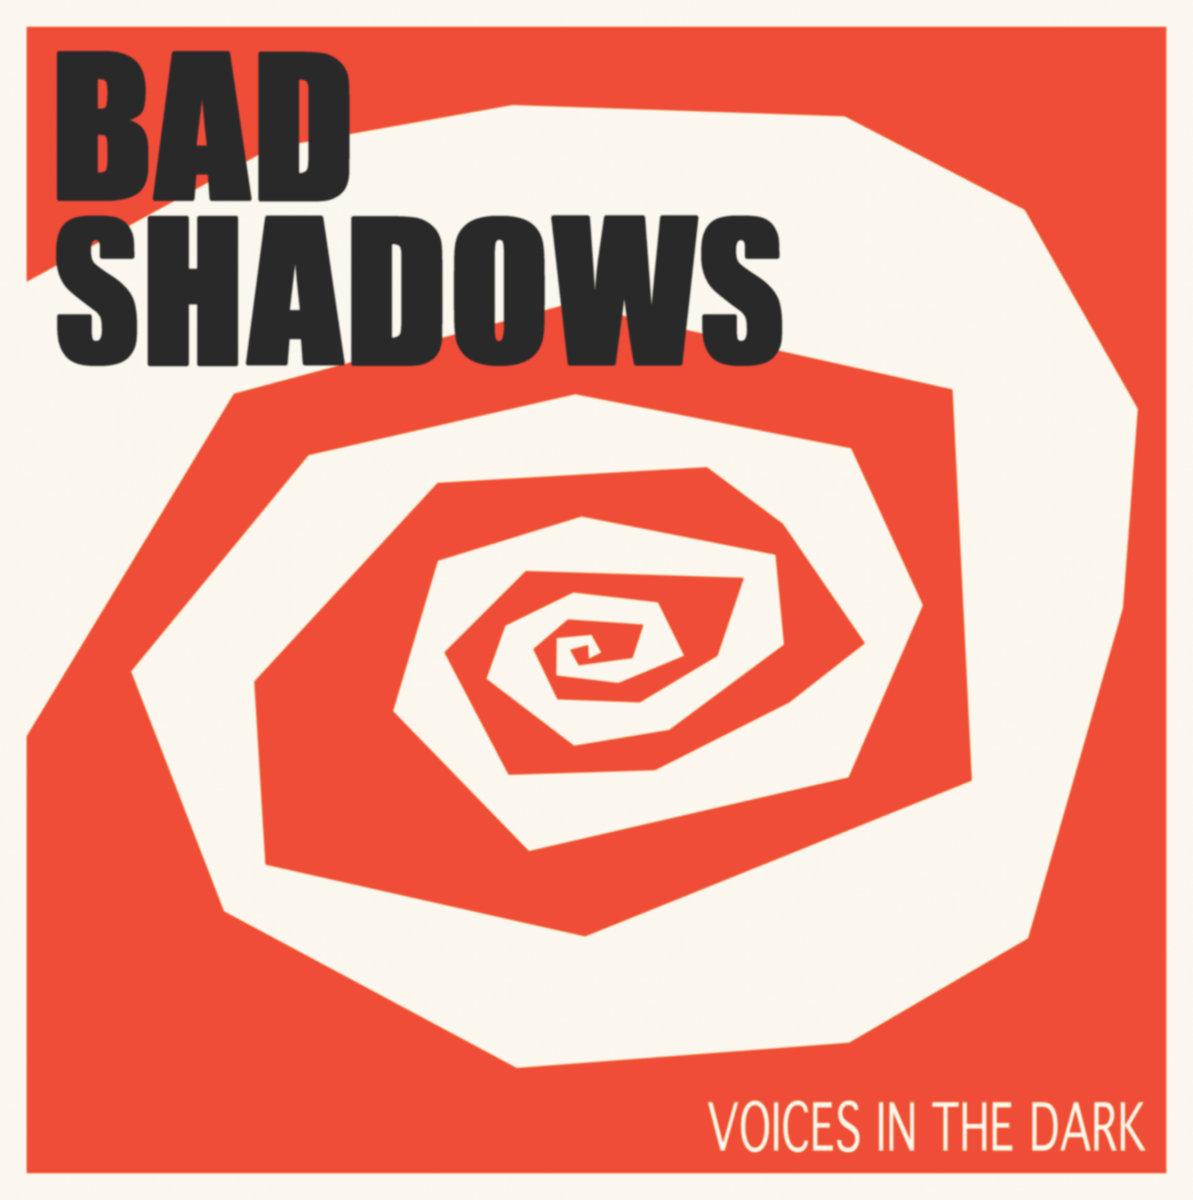 Bad Shadows LP art